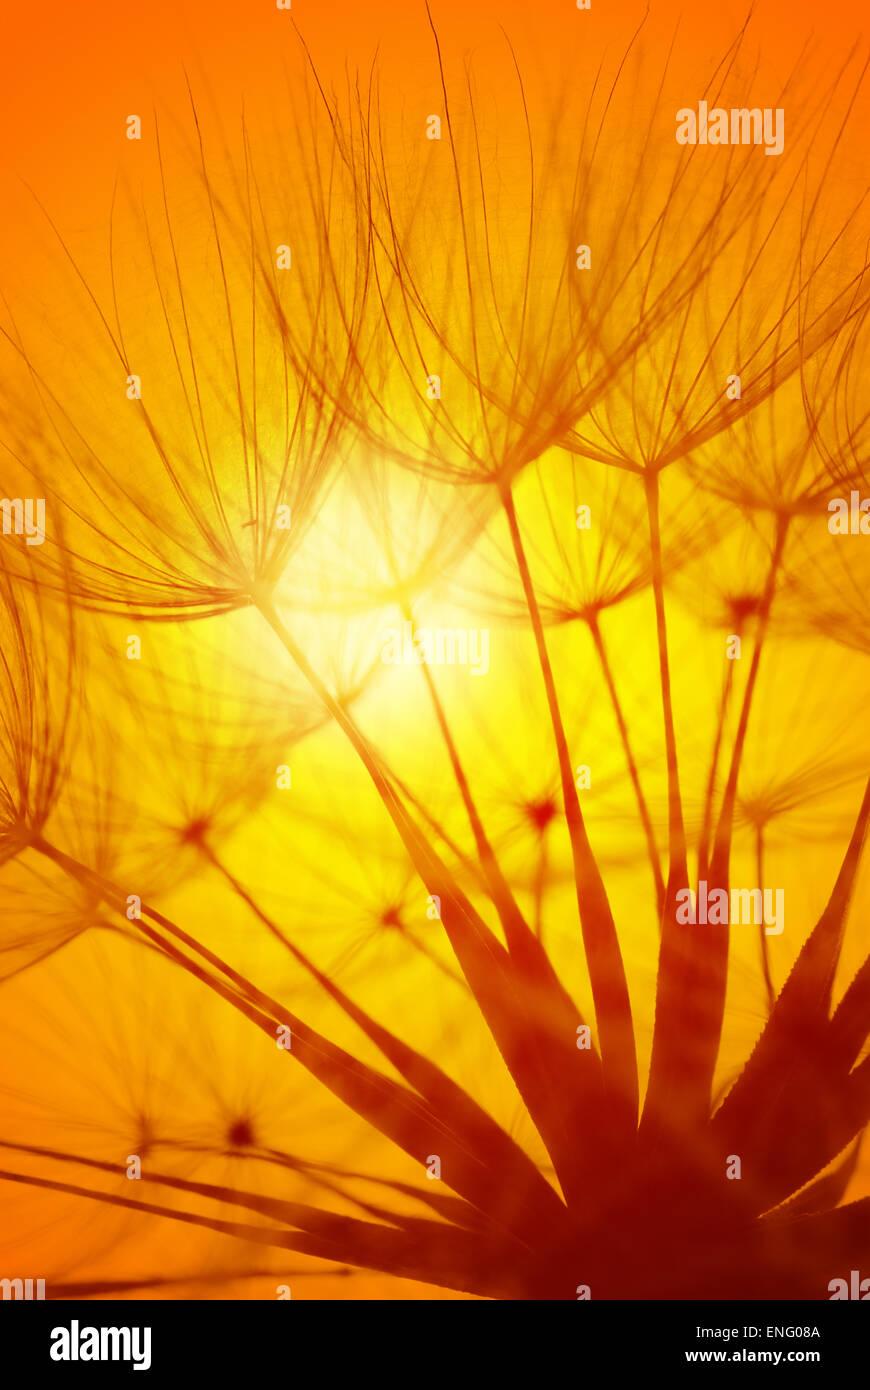 head of wind closk against setting golden warm orange glow of sun evening sunset - Stock Image